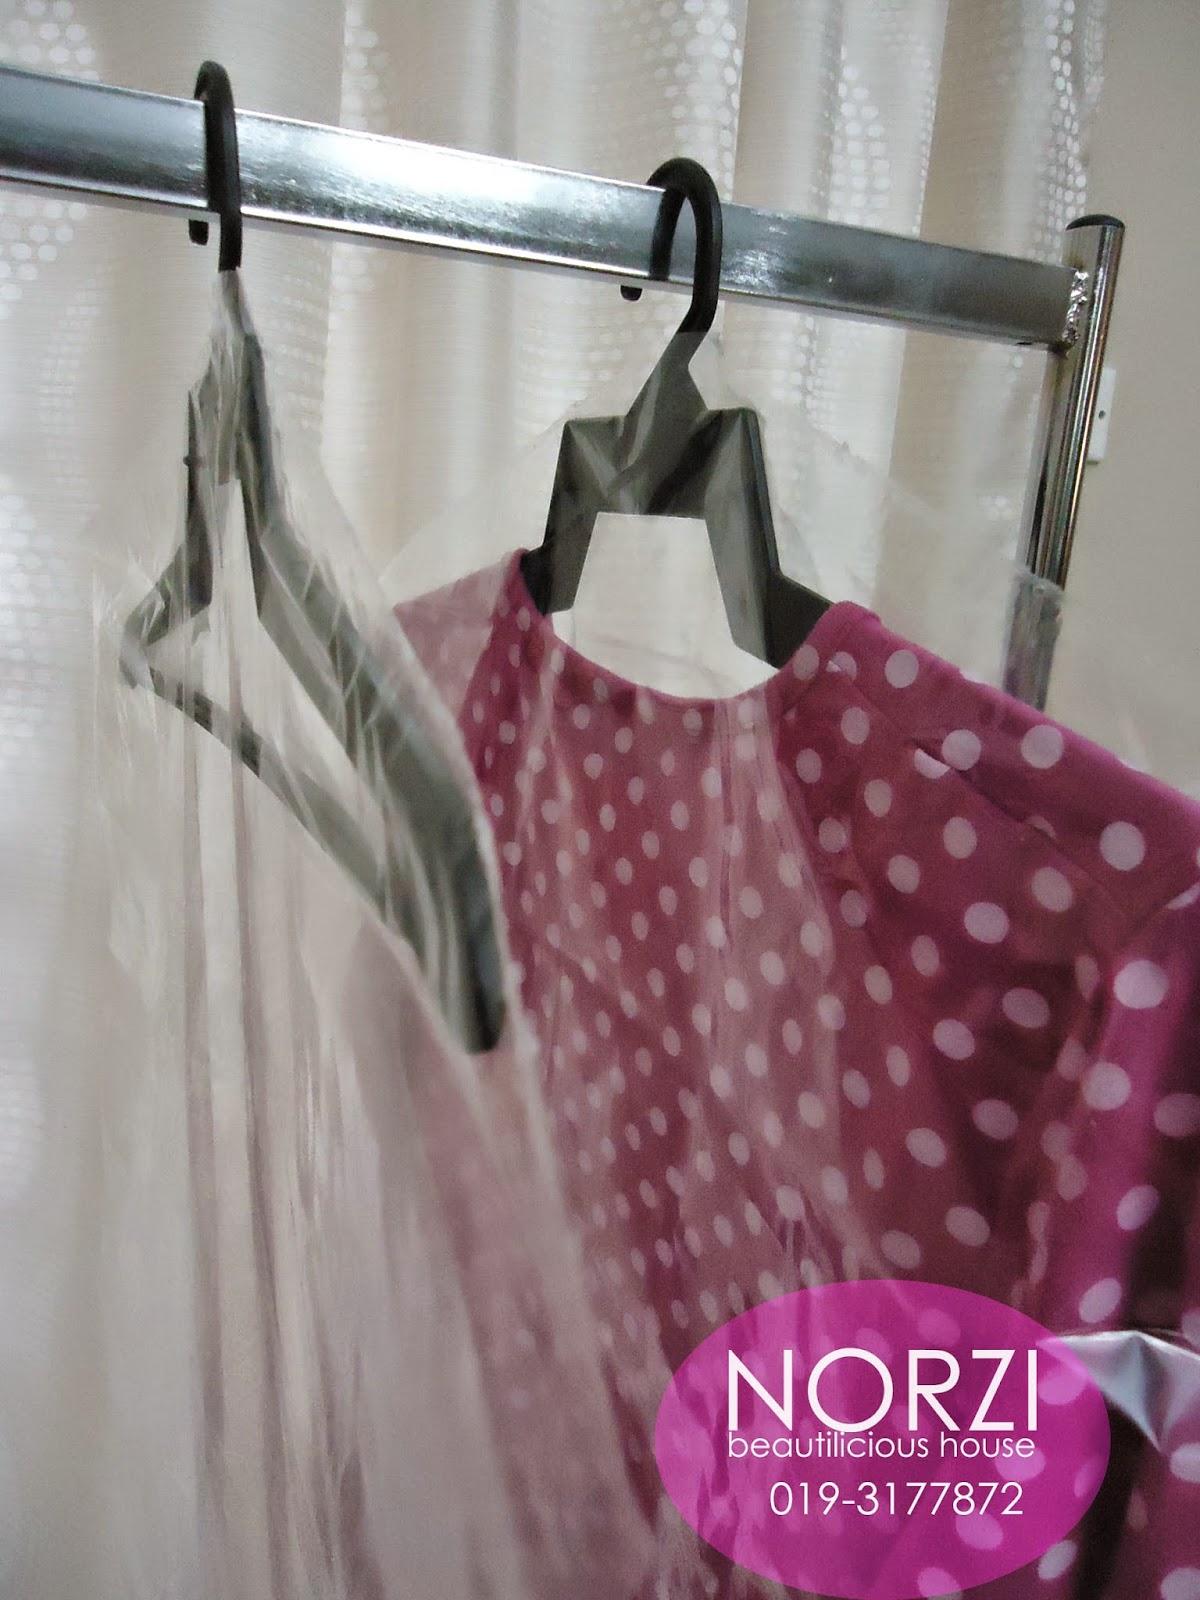 plastik murah gantung blouse di butik